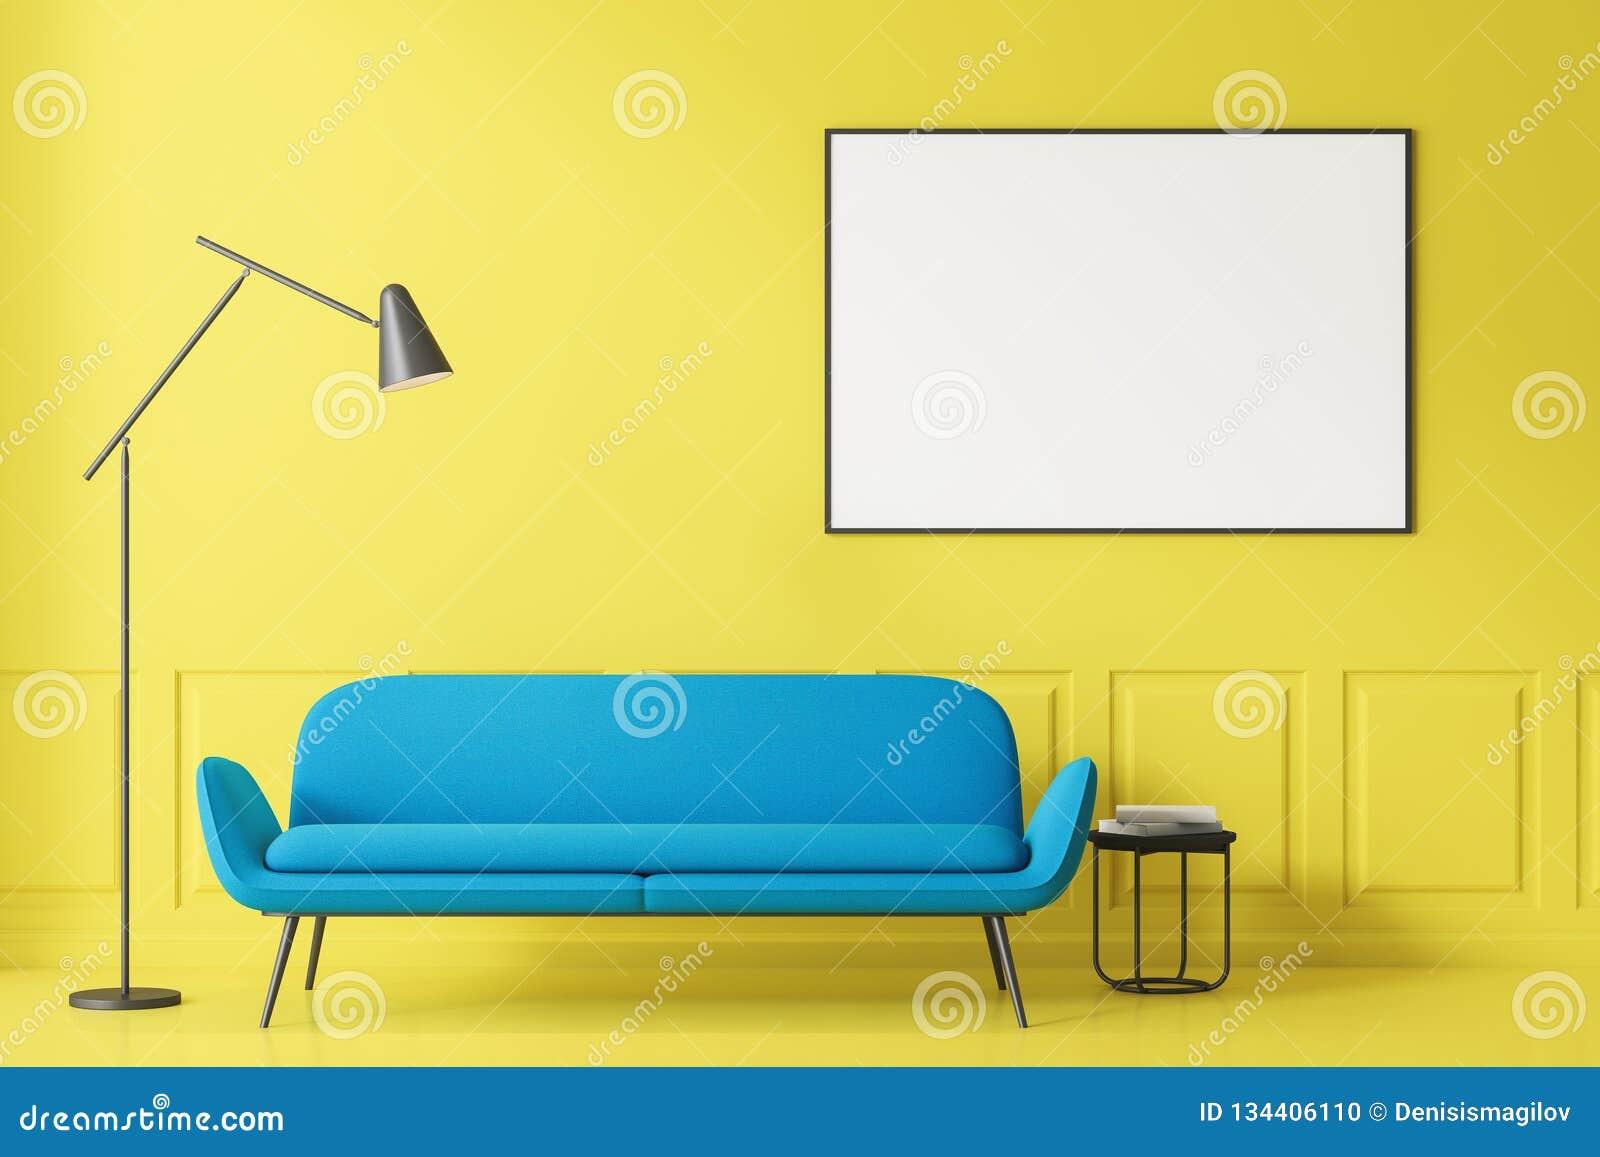 Yellow Living Room Blue Sofa And Poster Stock Illustration Illustration Of Floor Minimal 134406110